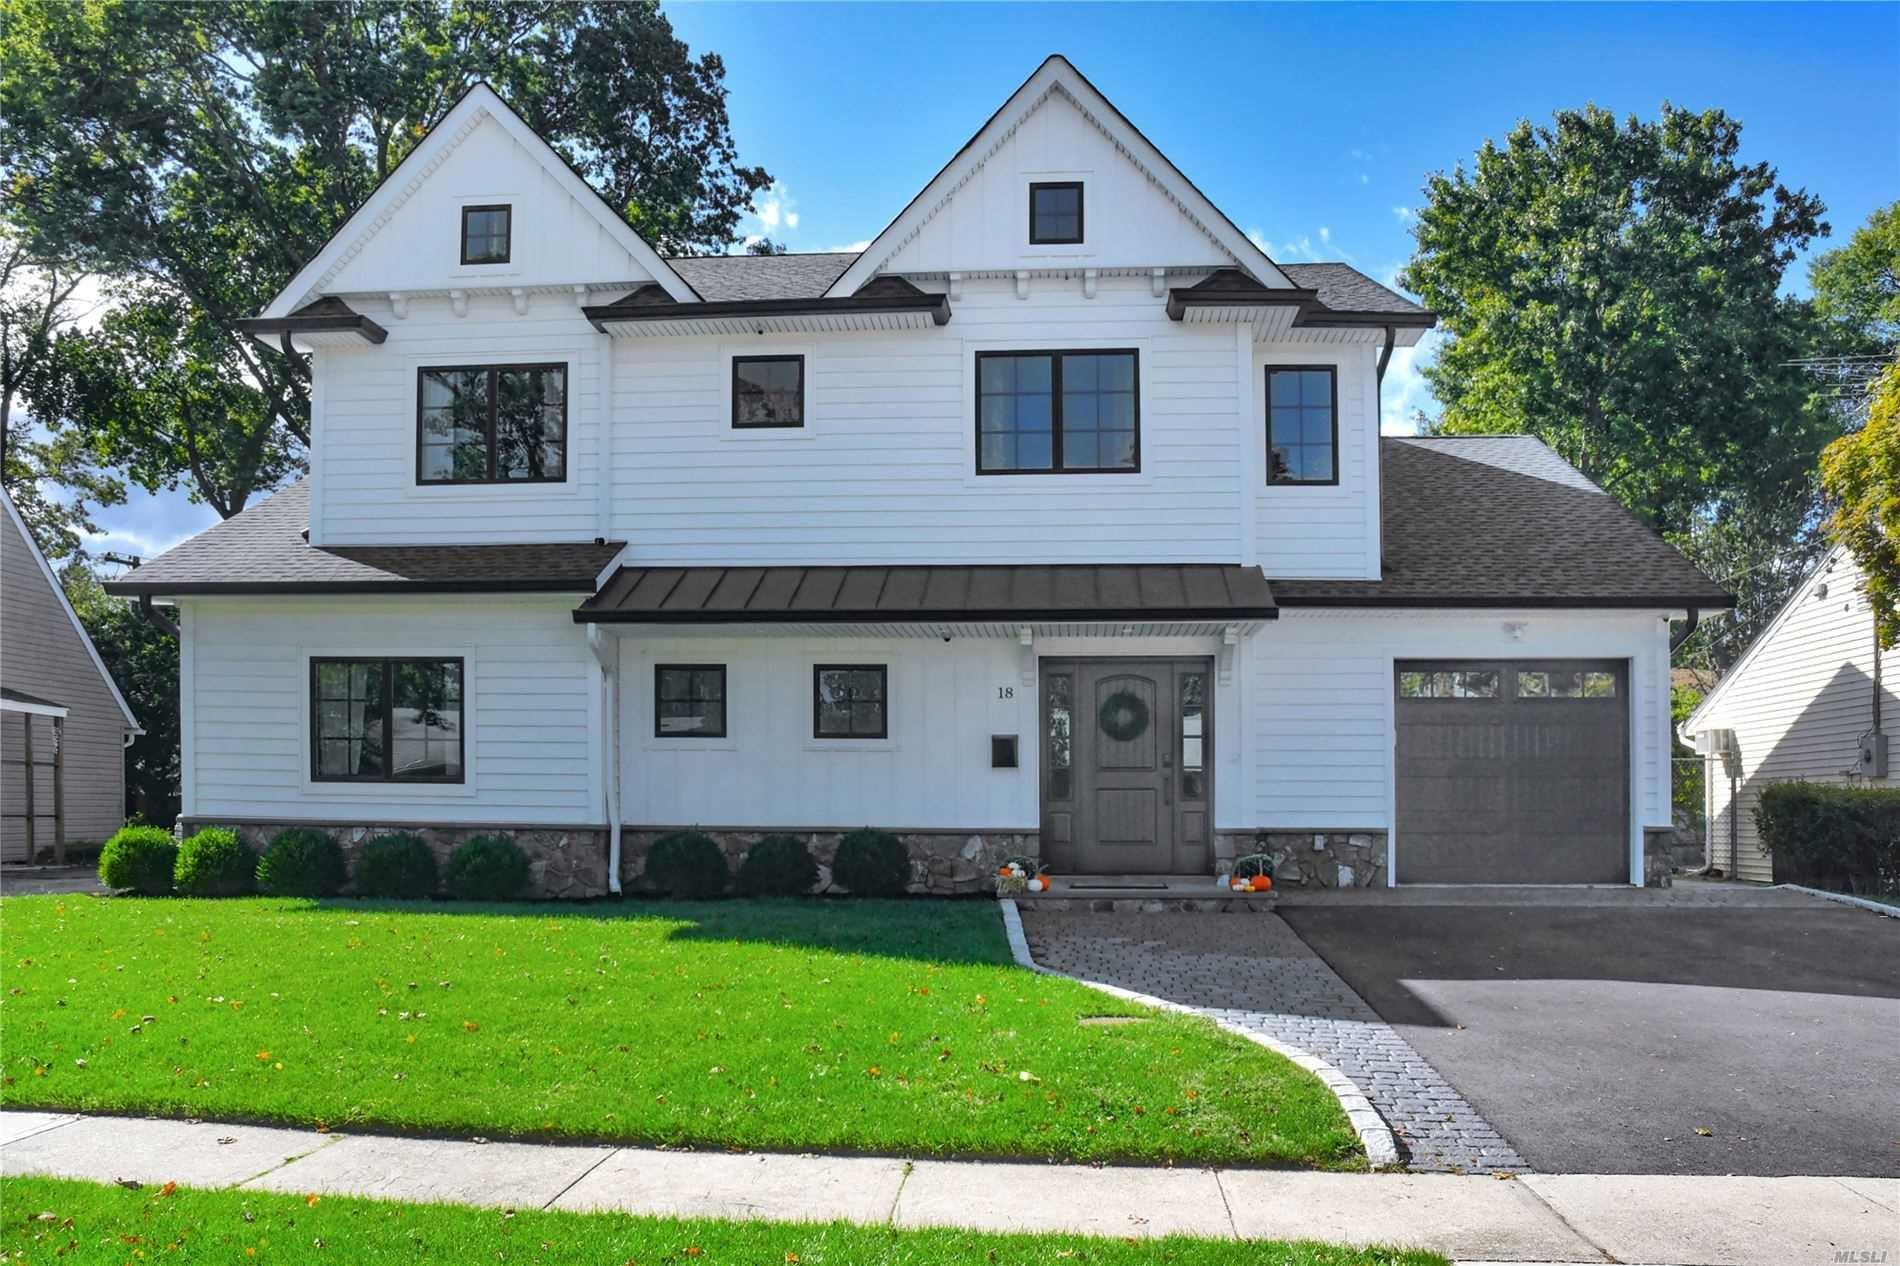 18 Robert Road, Glen Head, NY 11545 - MLS#: 3197507